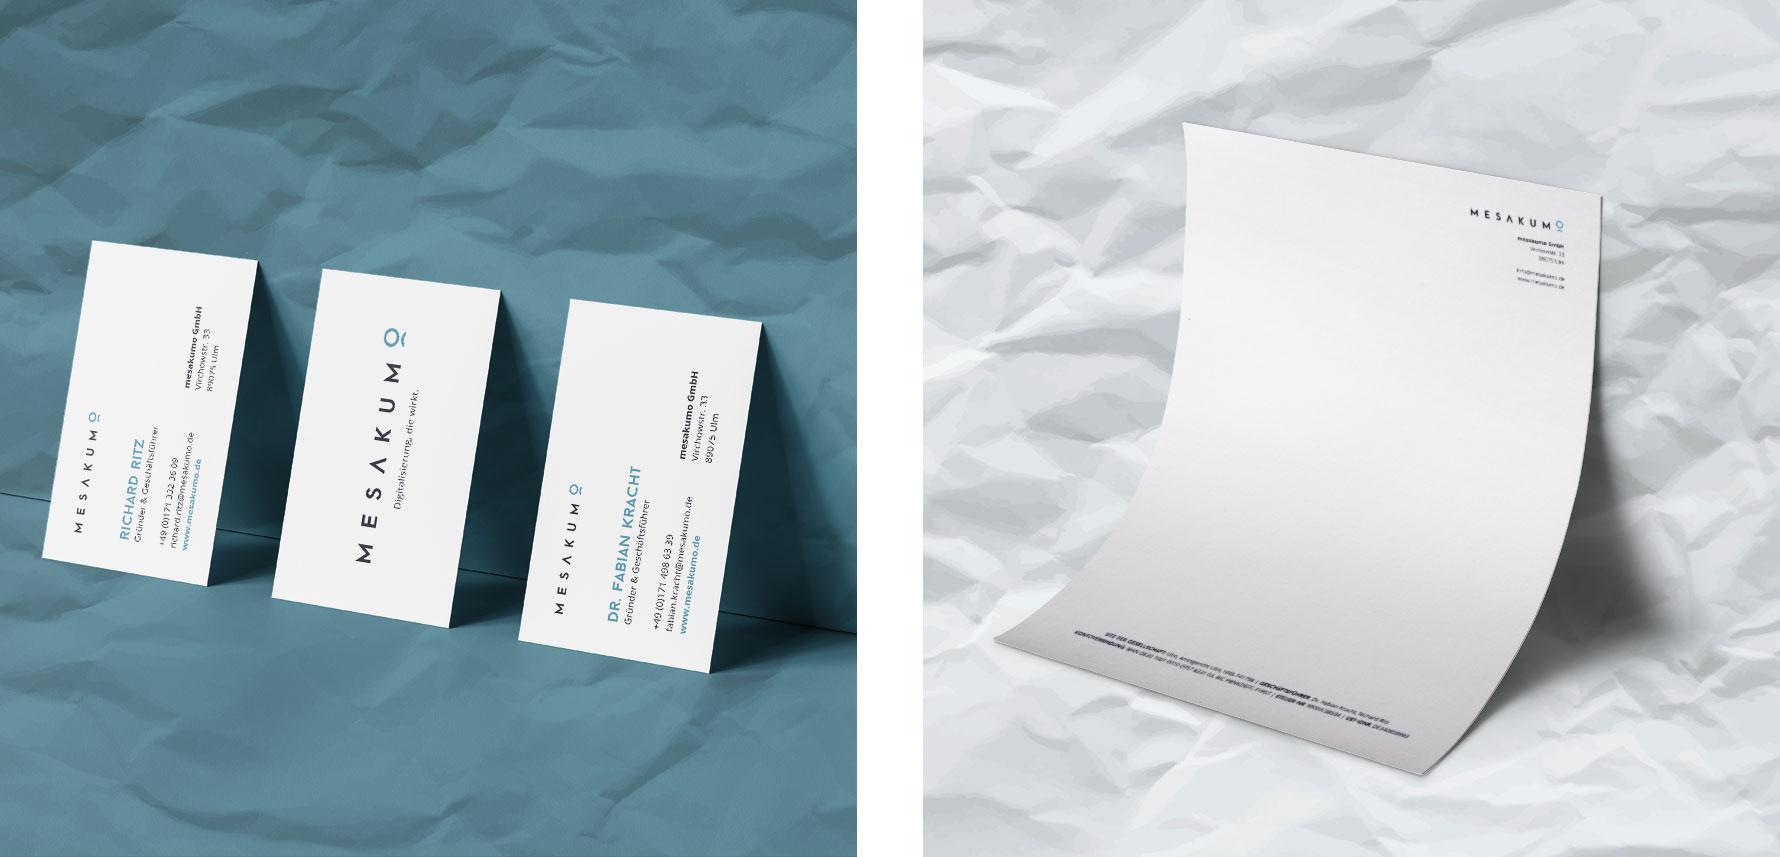 Hüfner Design | Referenz mesakumo | Geschäftsausstattung, Briefpapier, Visitenkarten